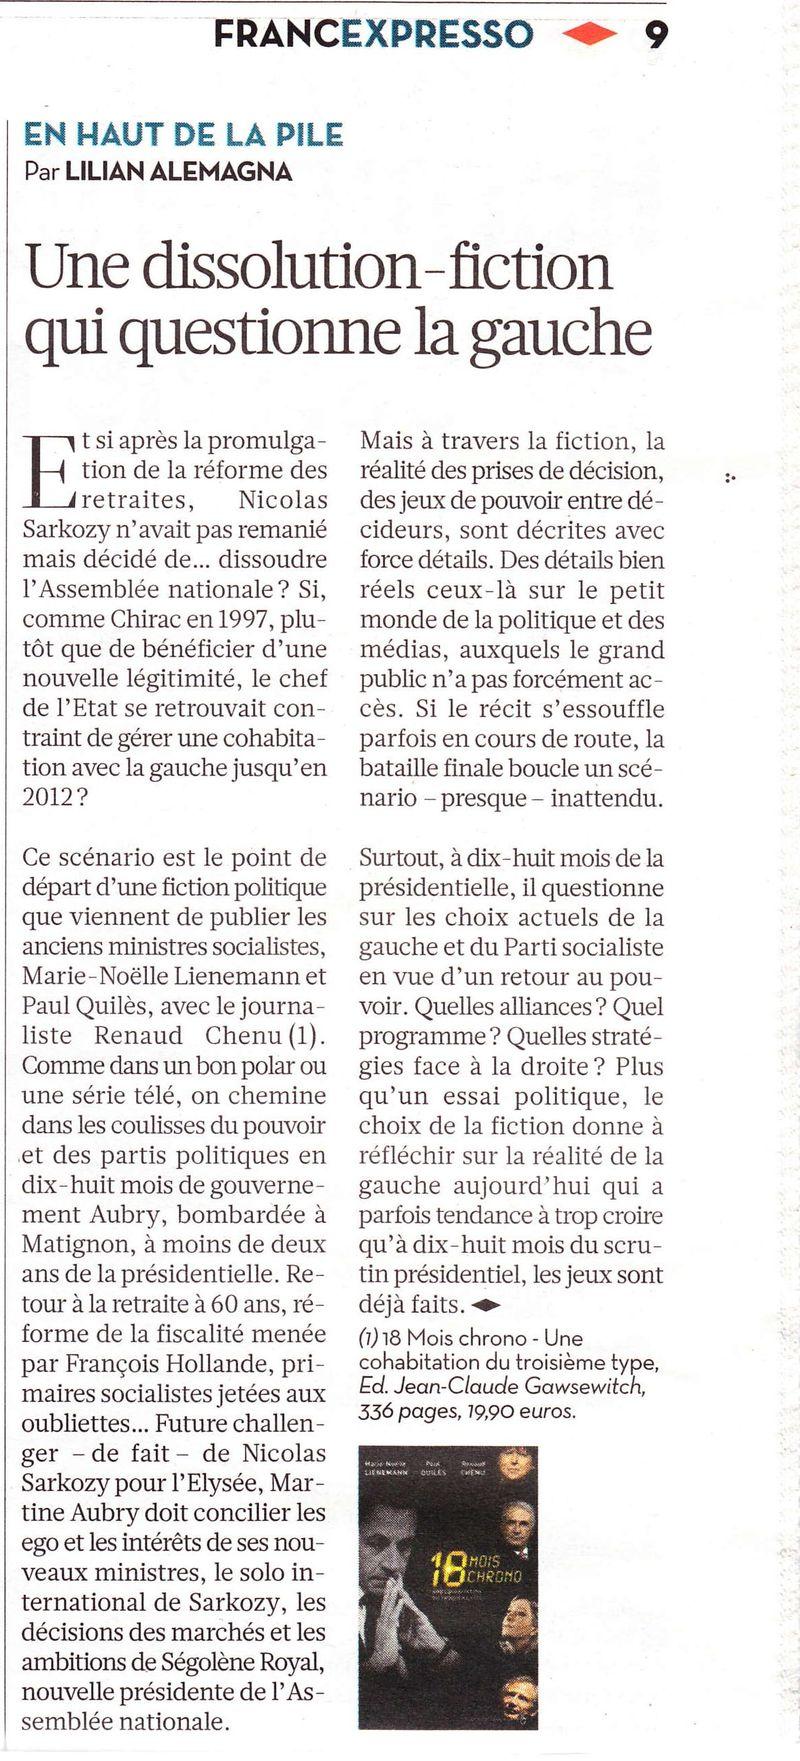 Libération 18 mois chron